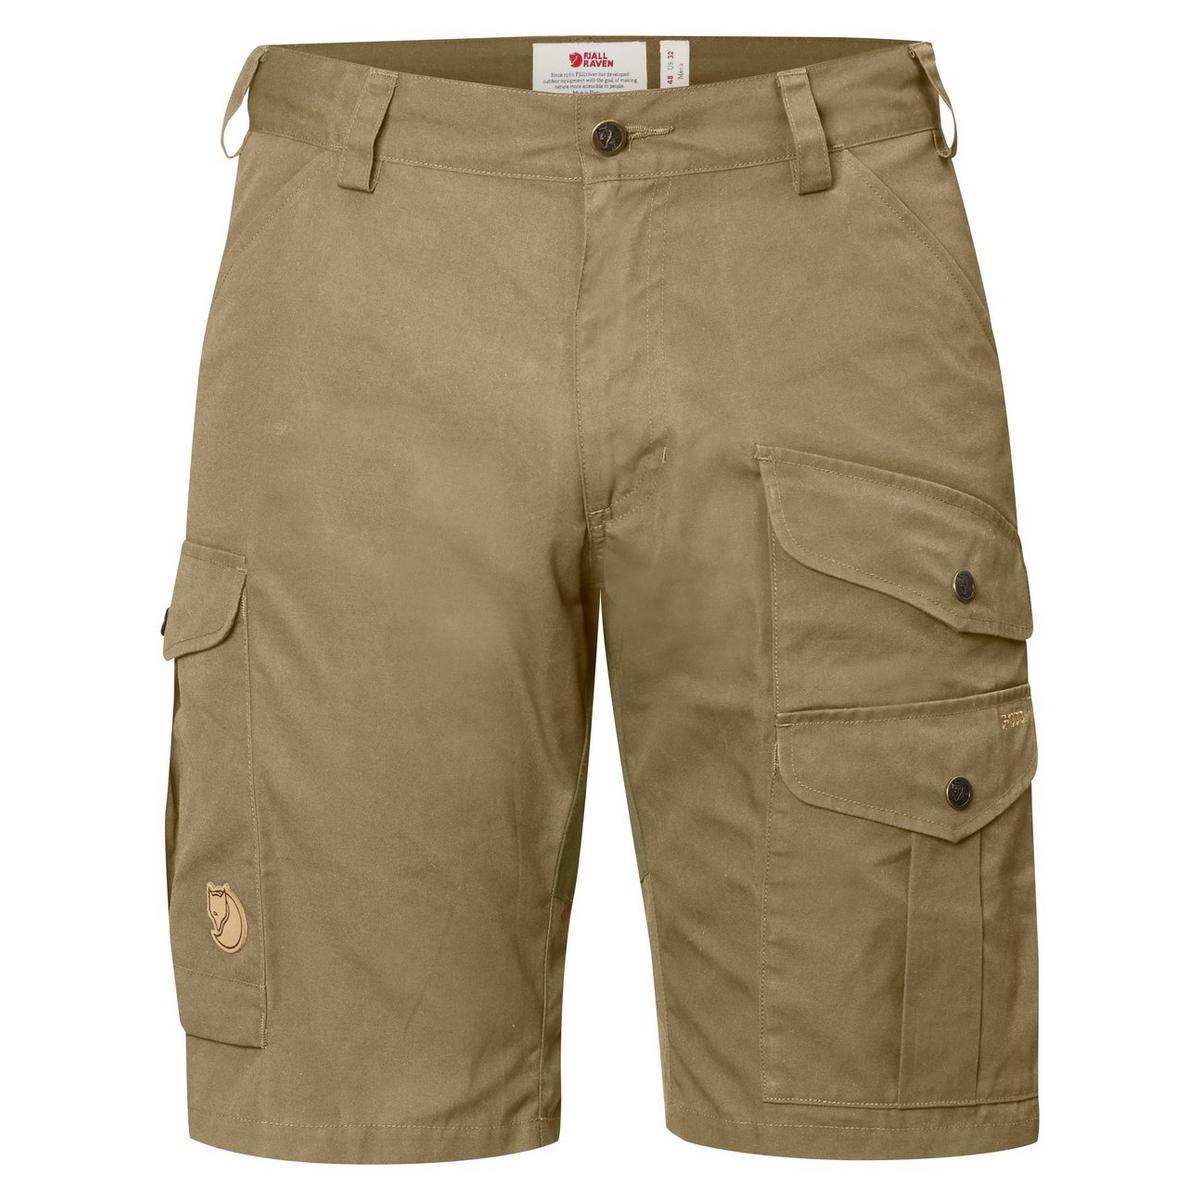 Fjallraven Men's Barents Pro Shorts - Sand